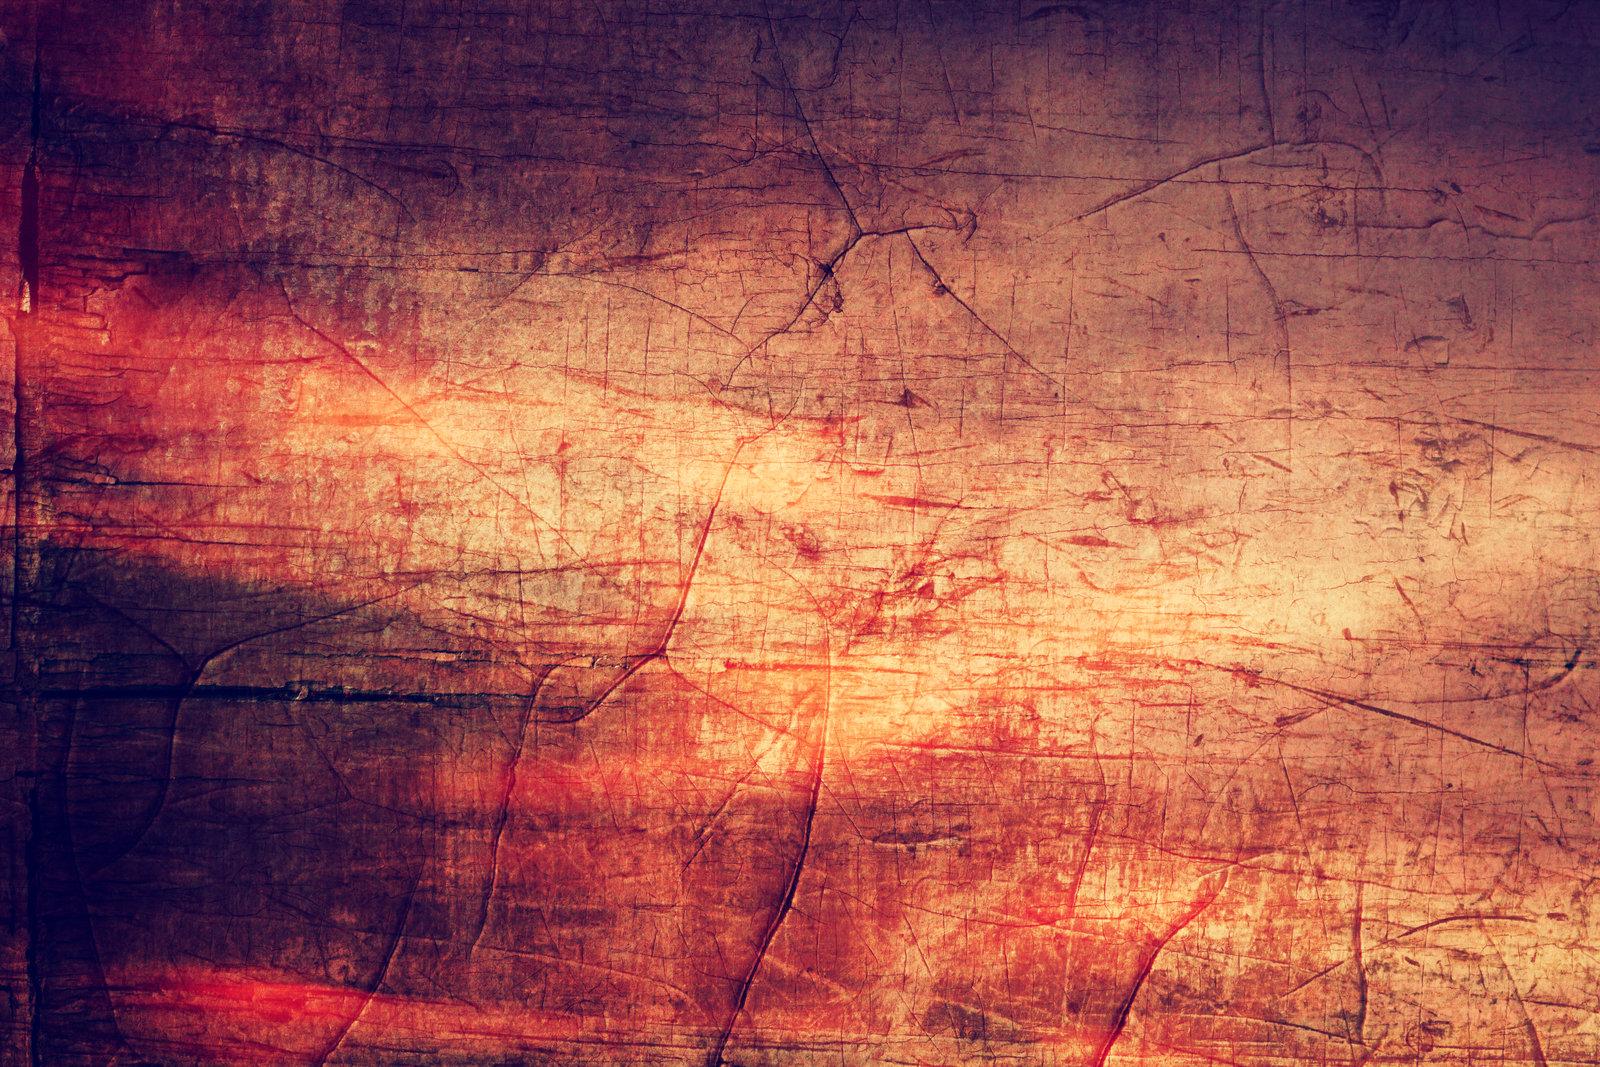 Текстуры картинки для фотошопа